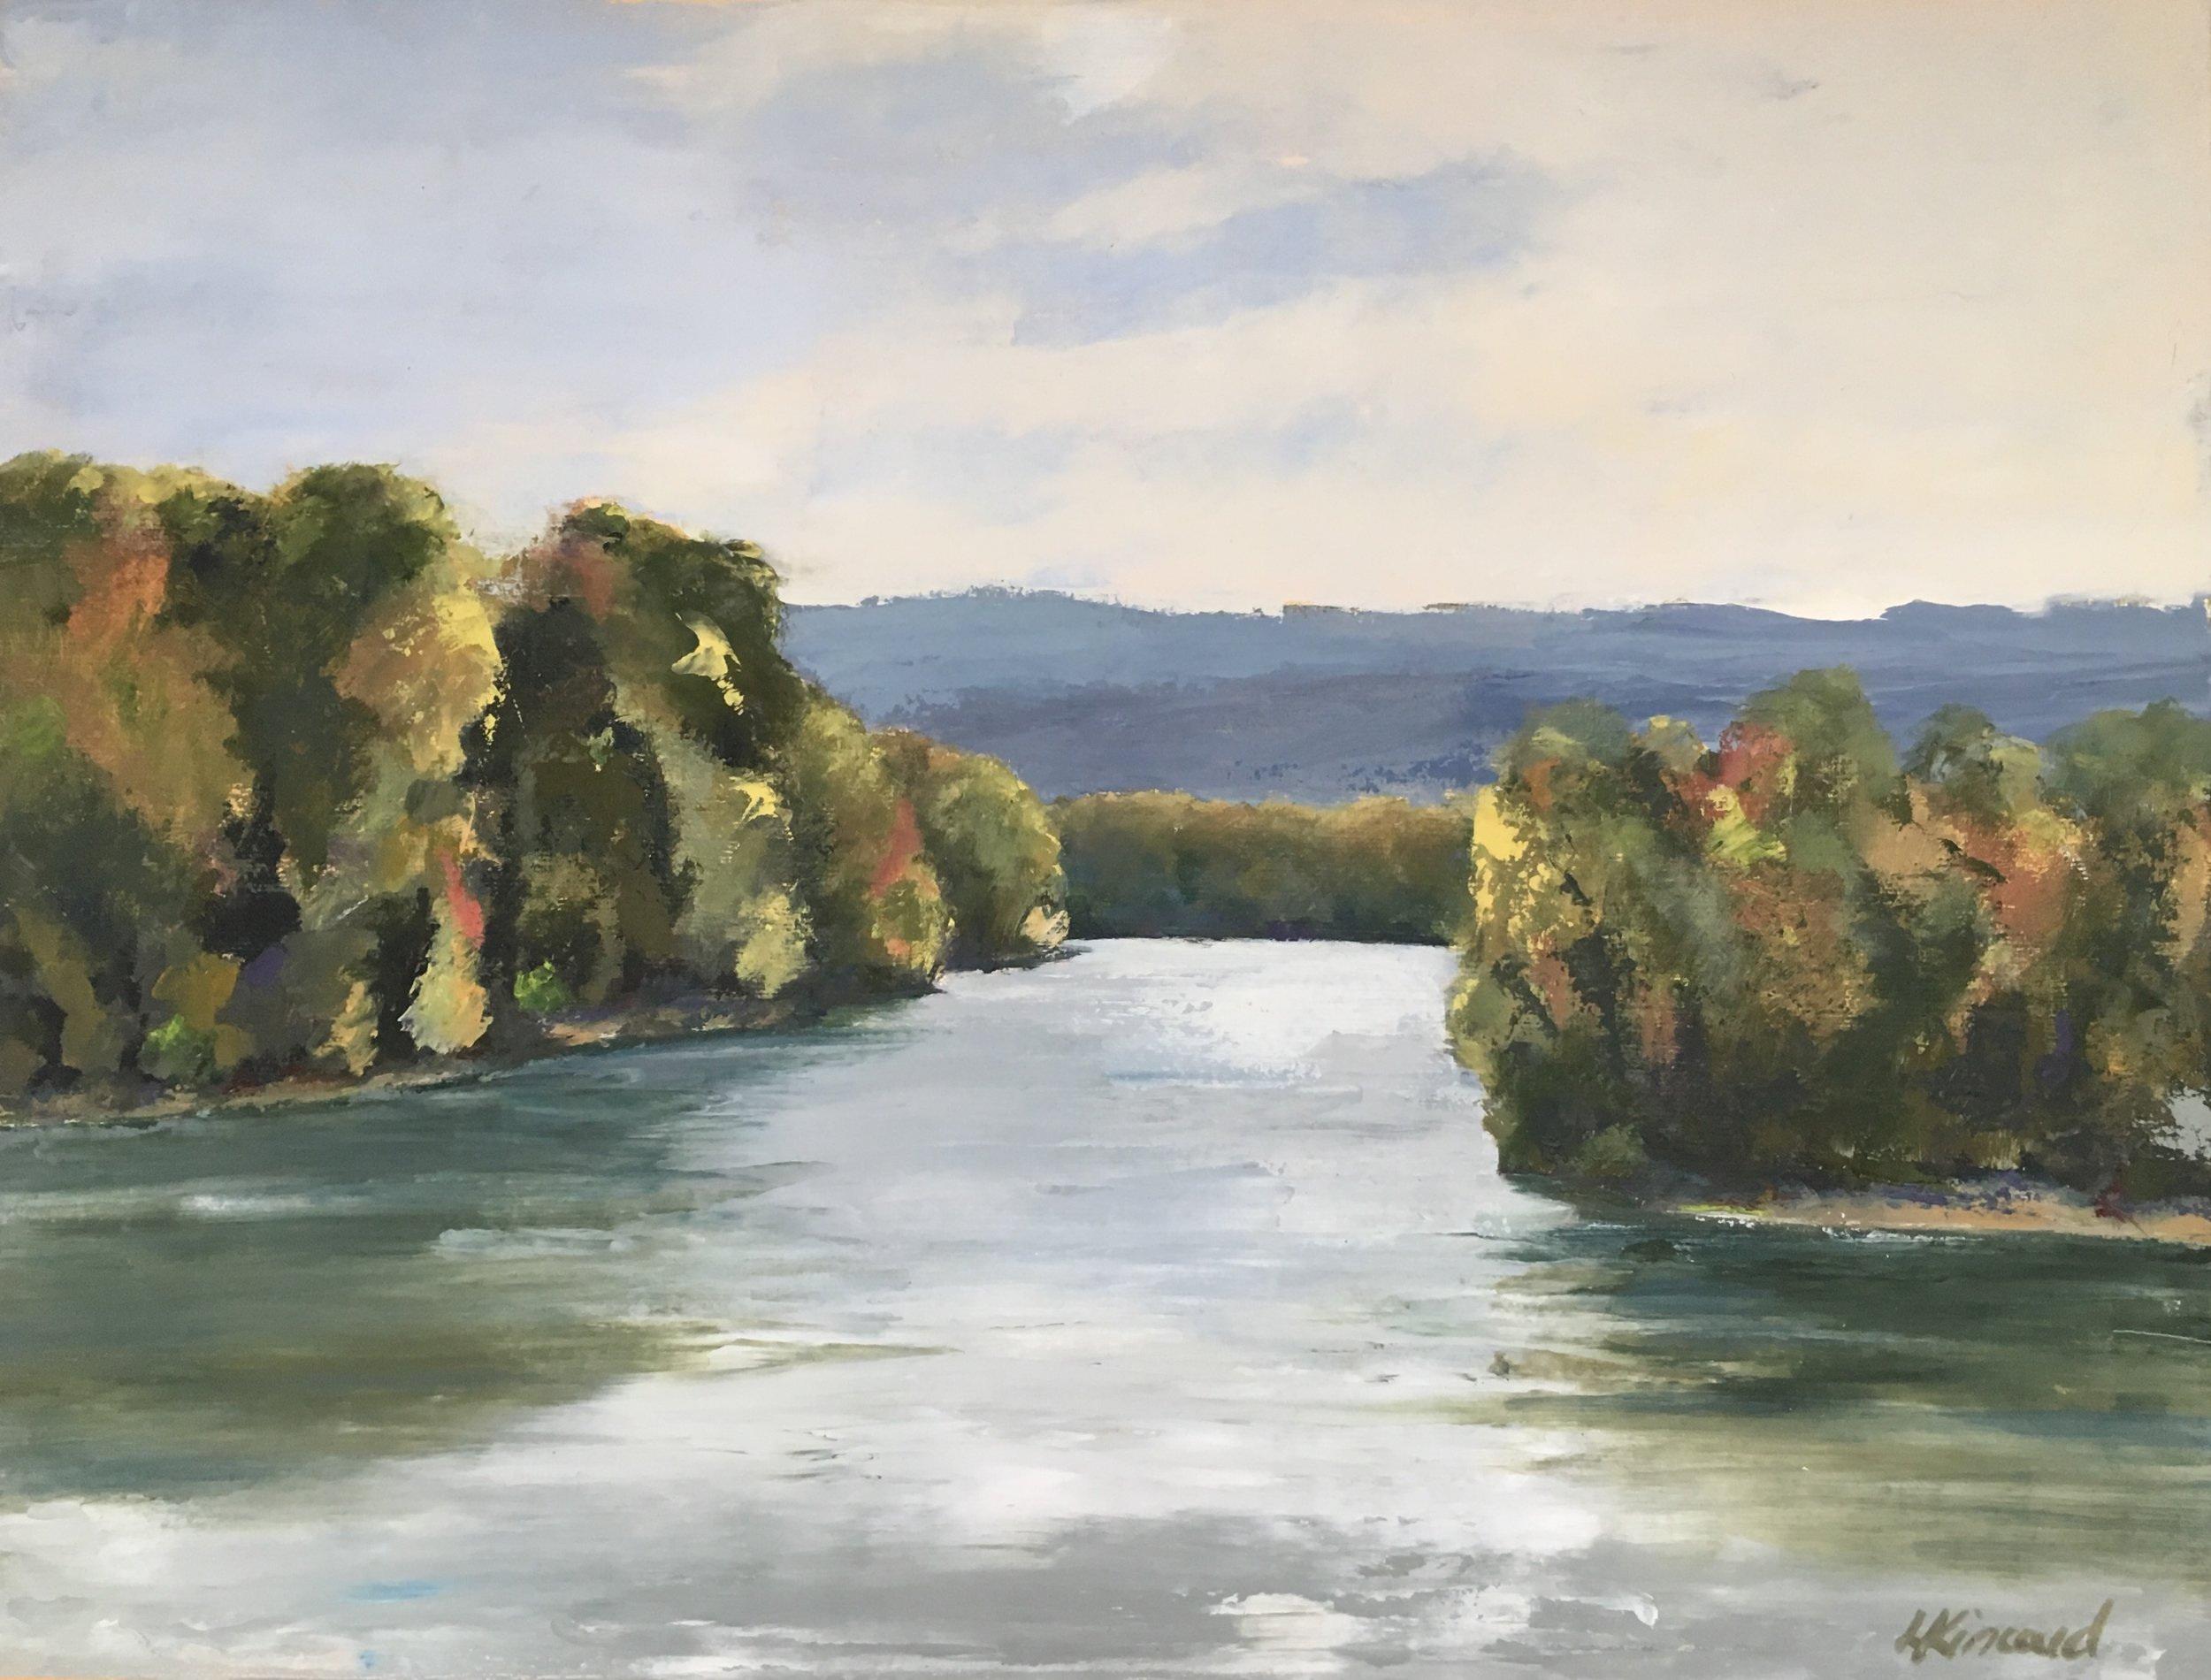 Morgan's Ford, Shenandoah River; oil on canvas; 12 x 16